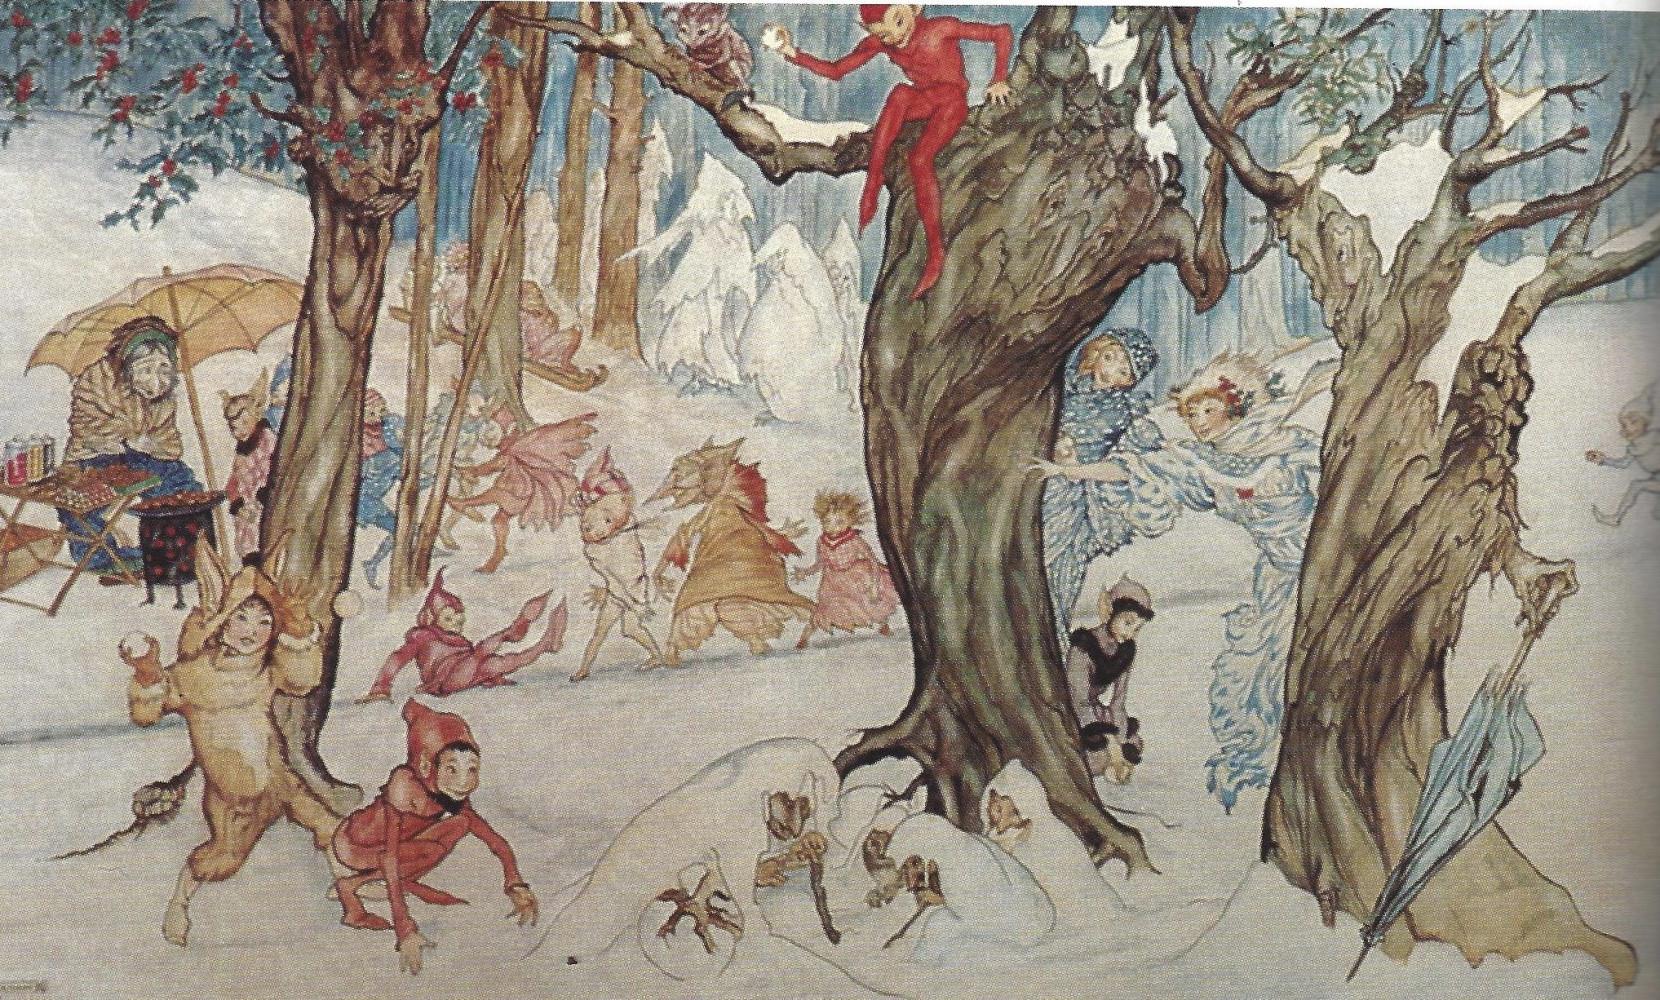 Winter Frolic by Arthur Rackham